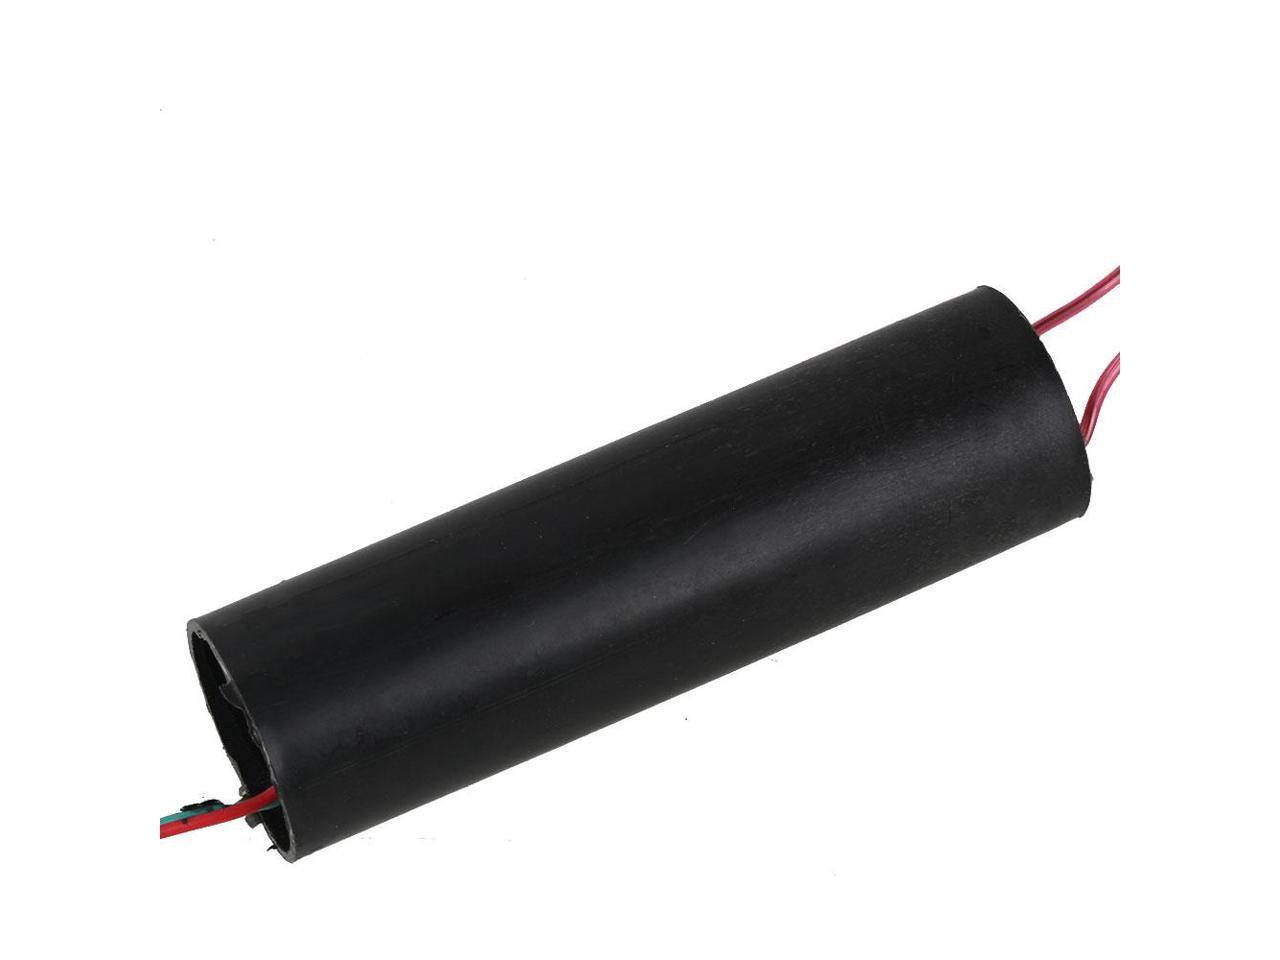 1000kv Ultra-high Voltage Pulse Generator Arc Pulse Ignition Coil Module Tool ^/&